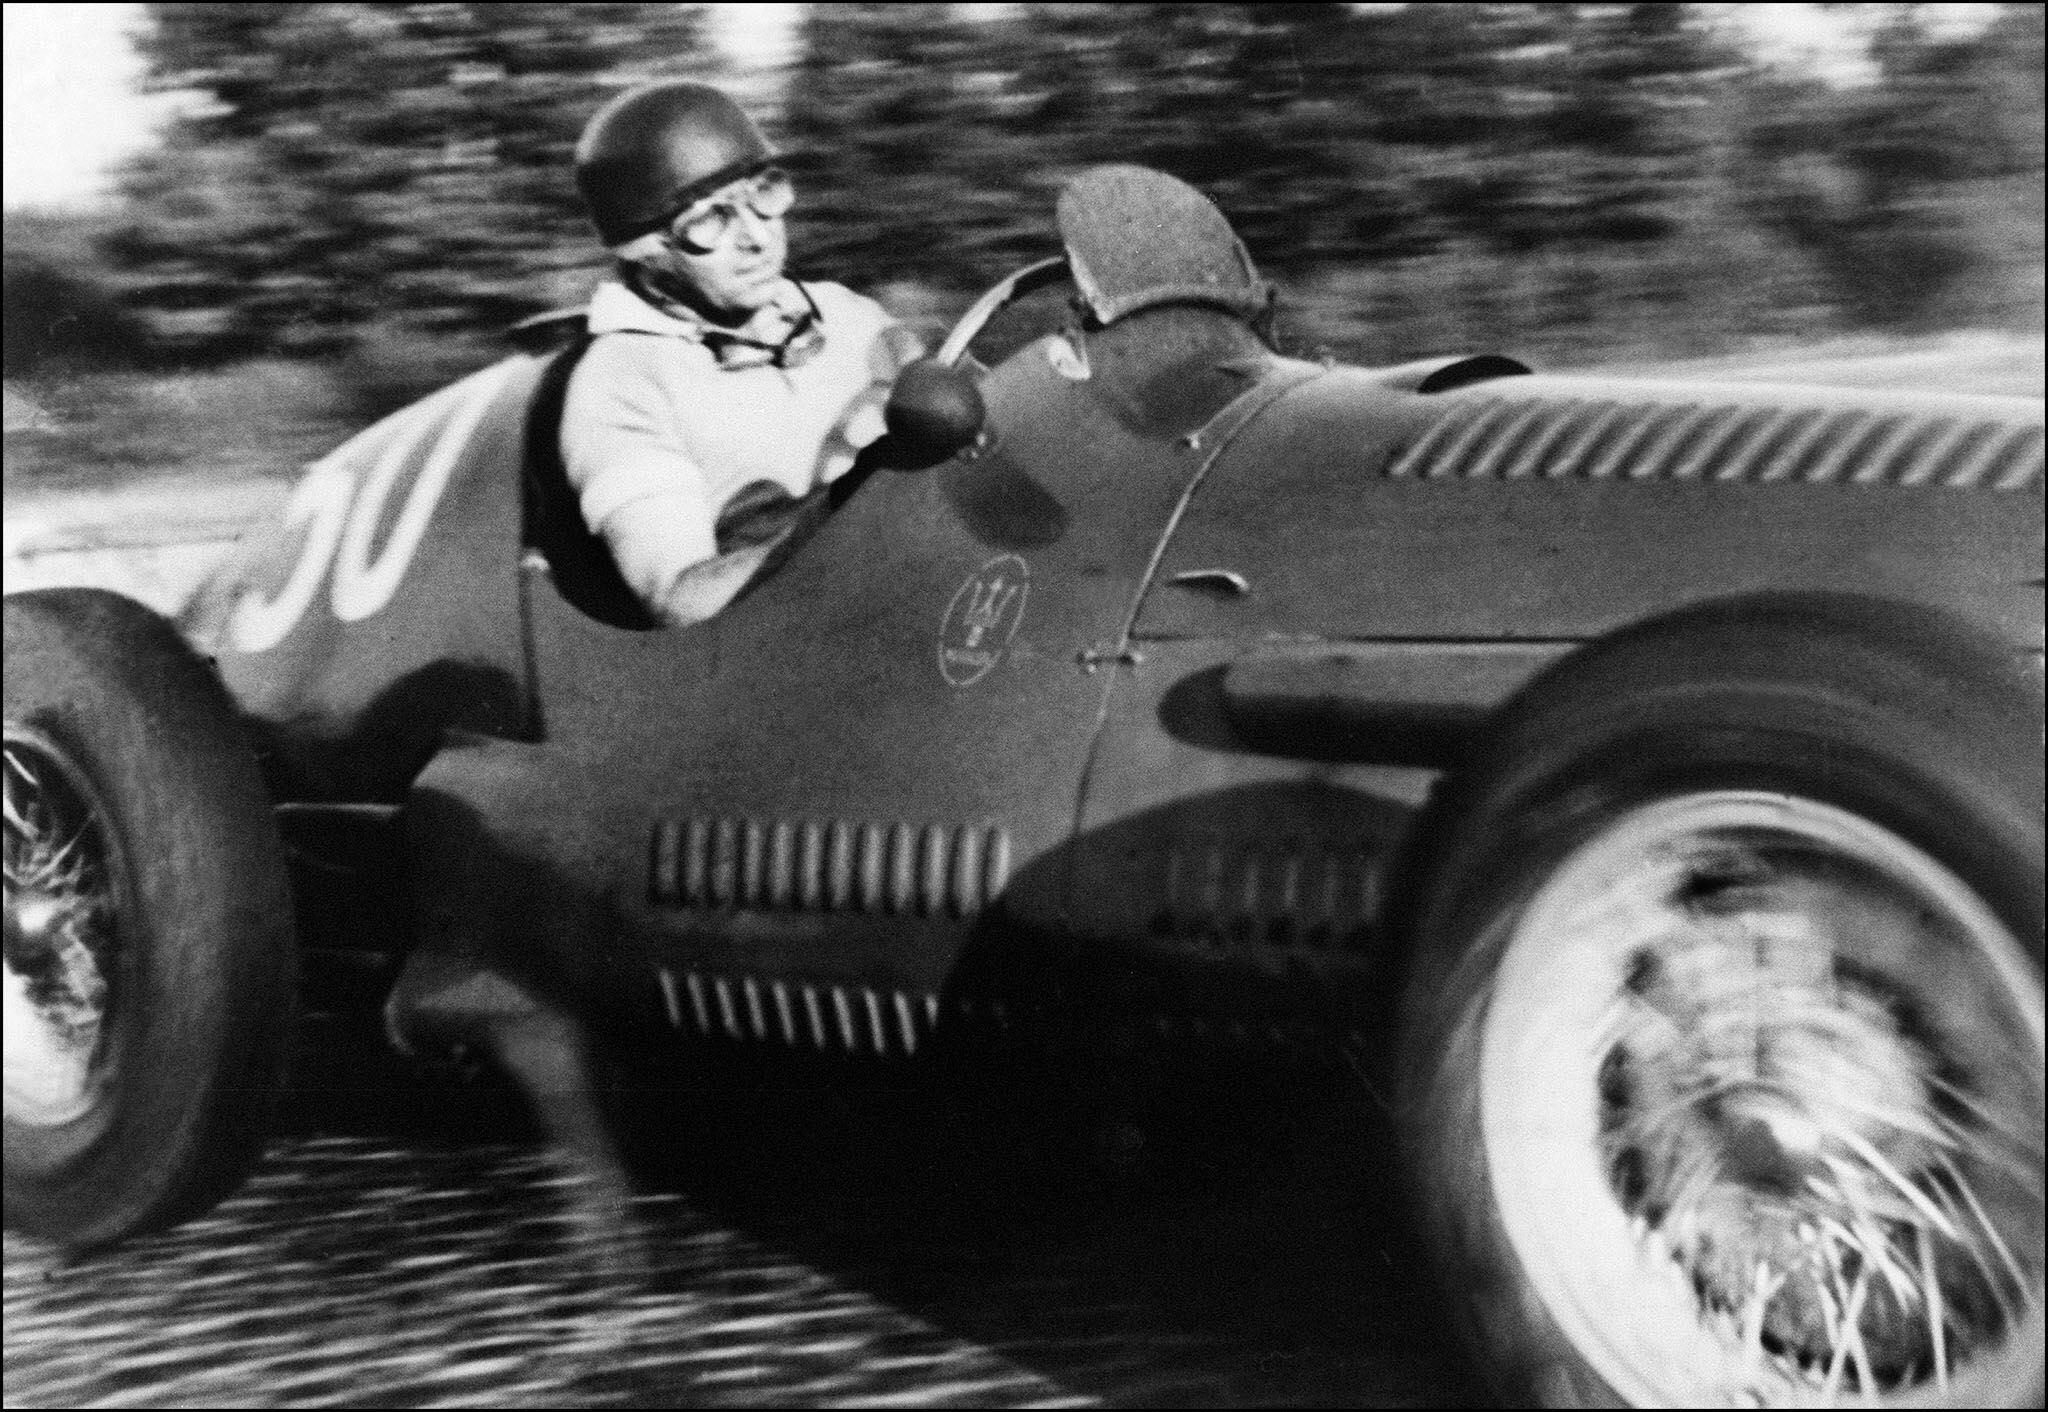 Bild zu Juan Manuel Fangio, Formel 1, 1953, Italien, Monza, Maserati